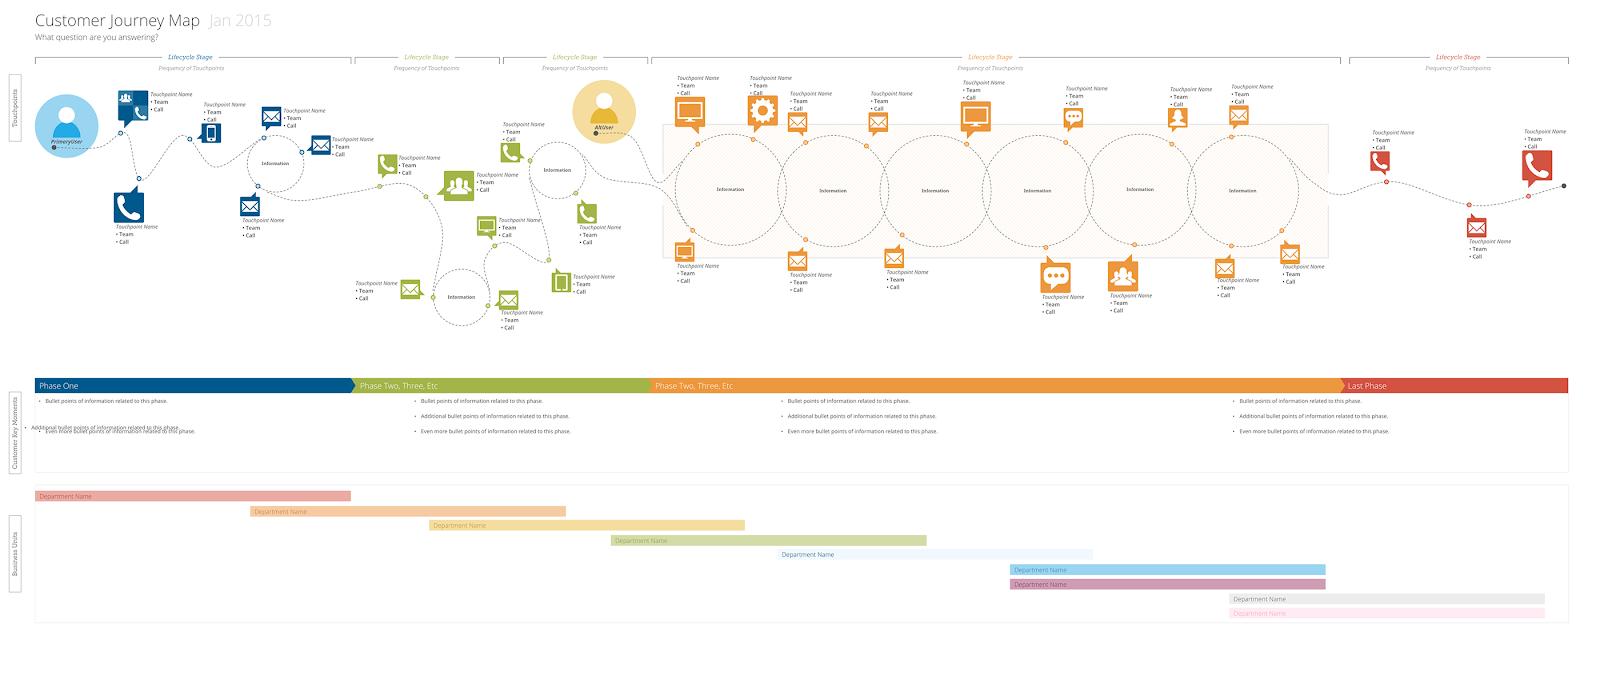 customer journey map visio omnigraph svg stencil